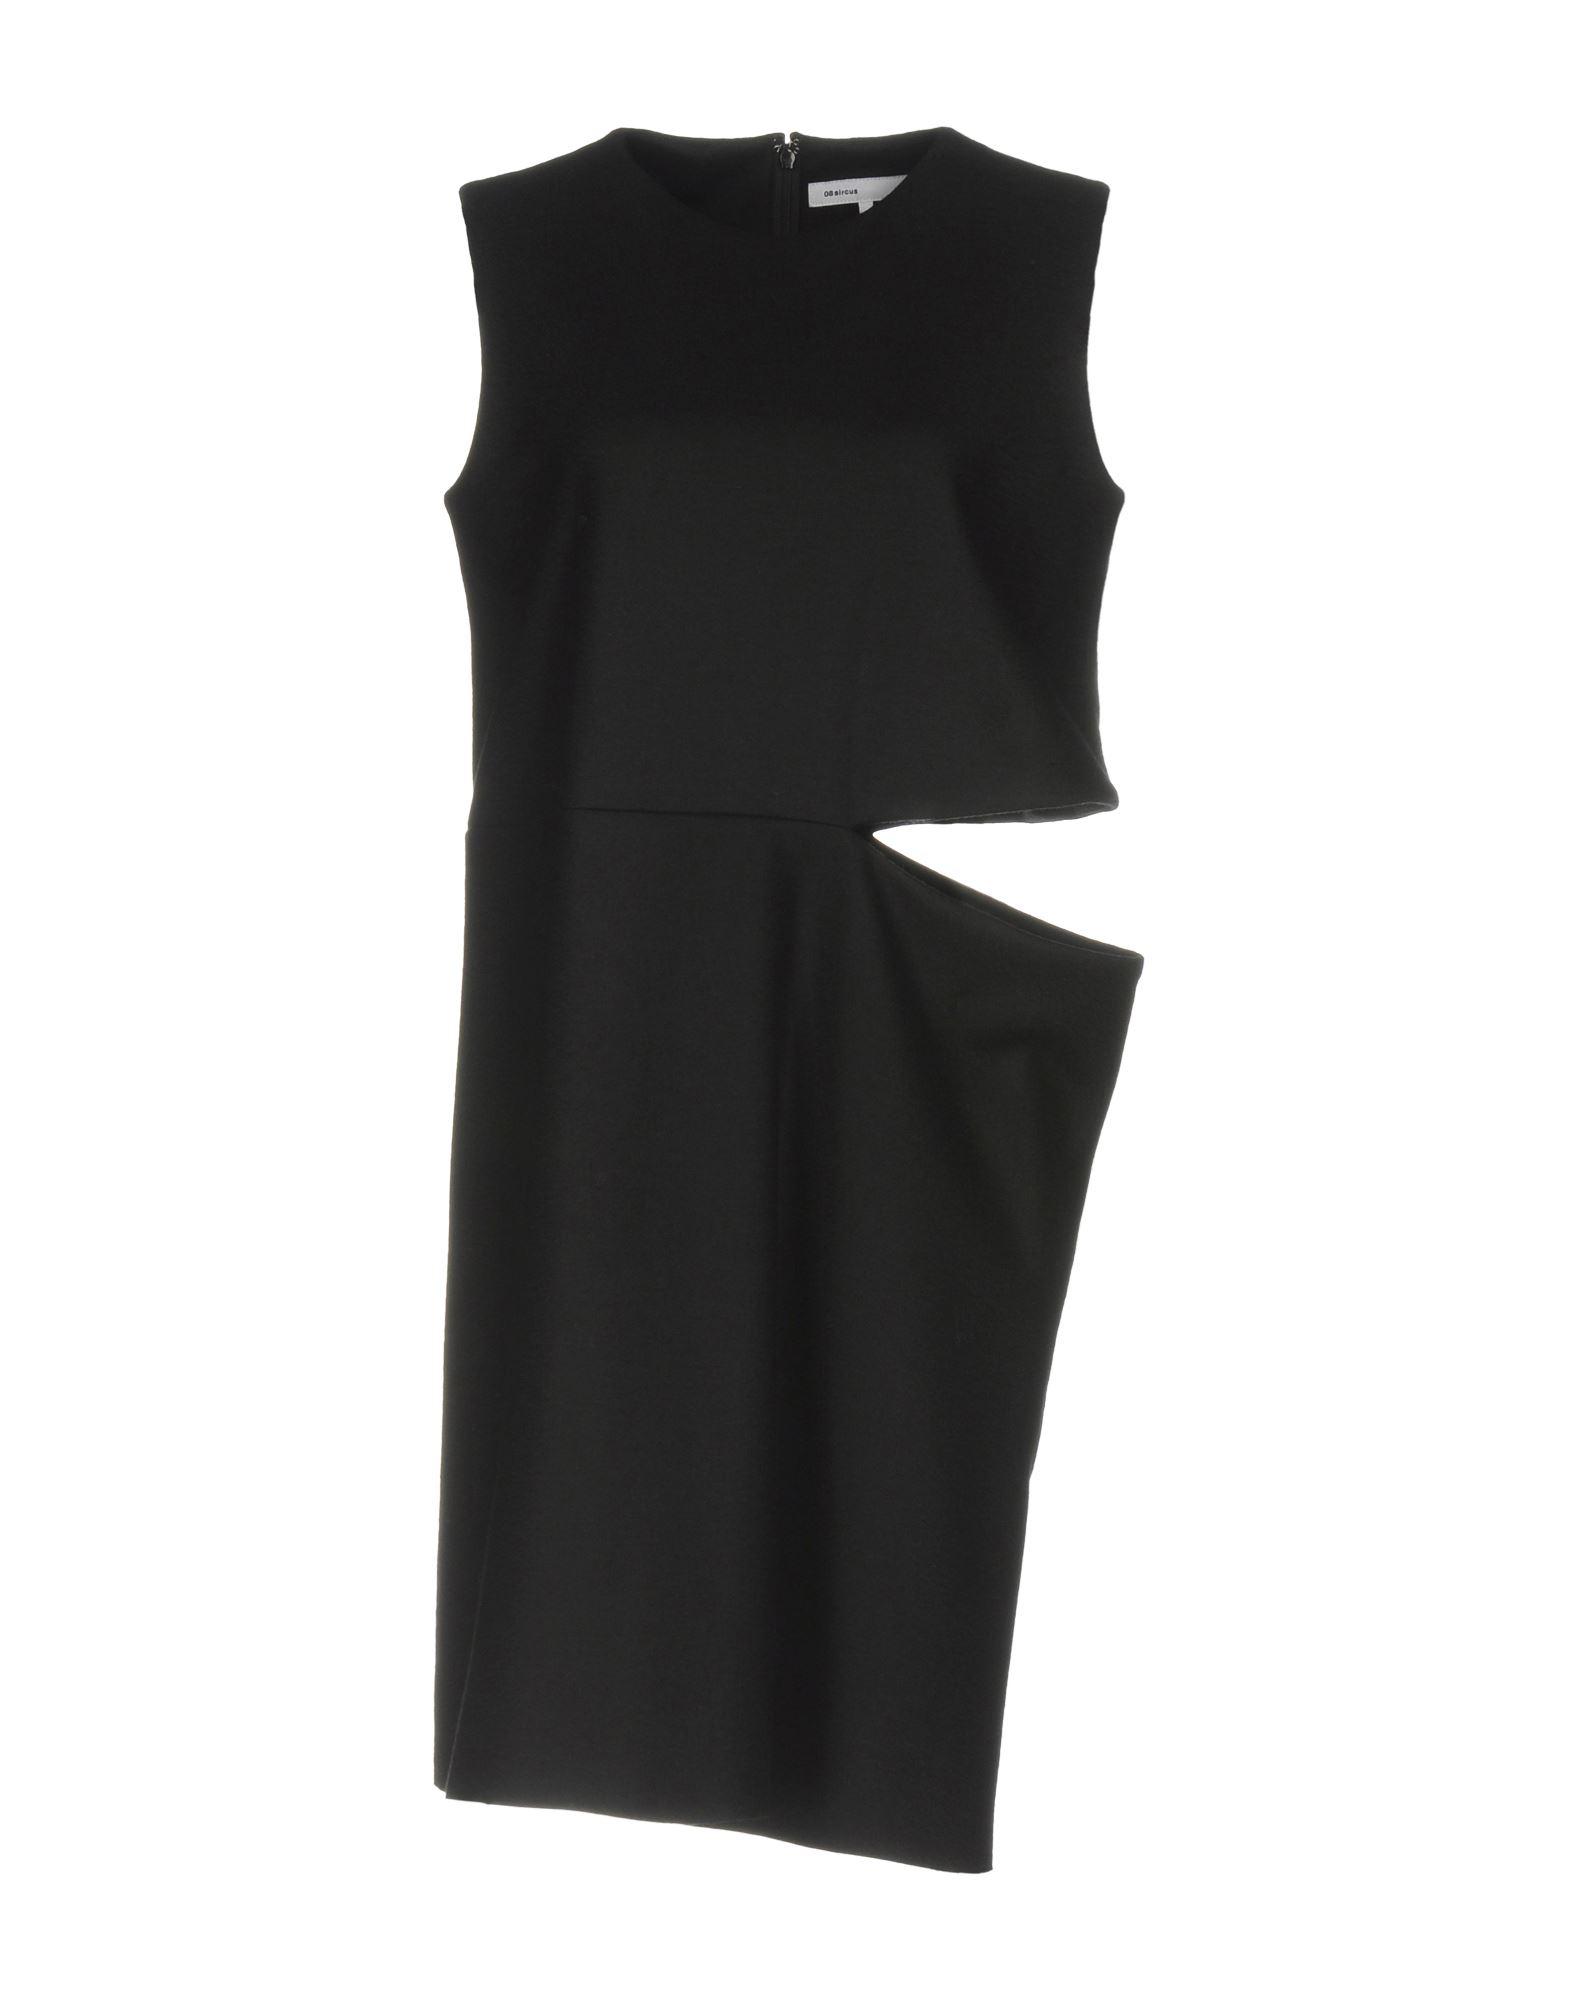 08 SIRCUS Короткое платье